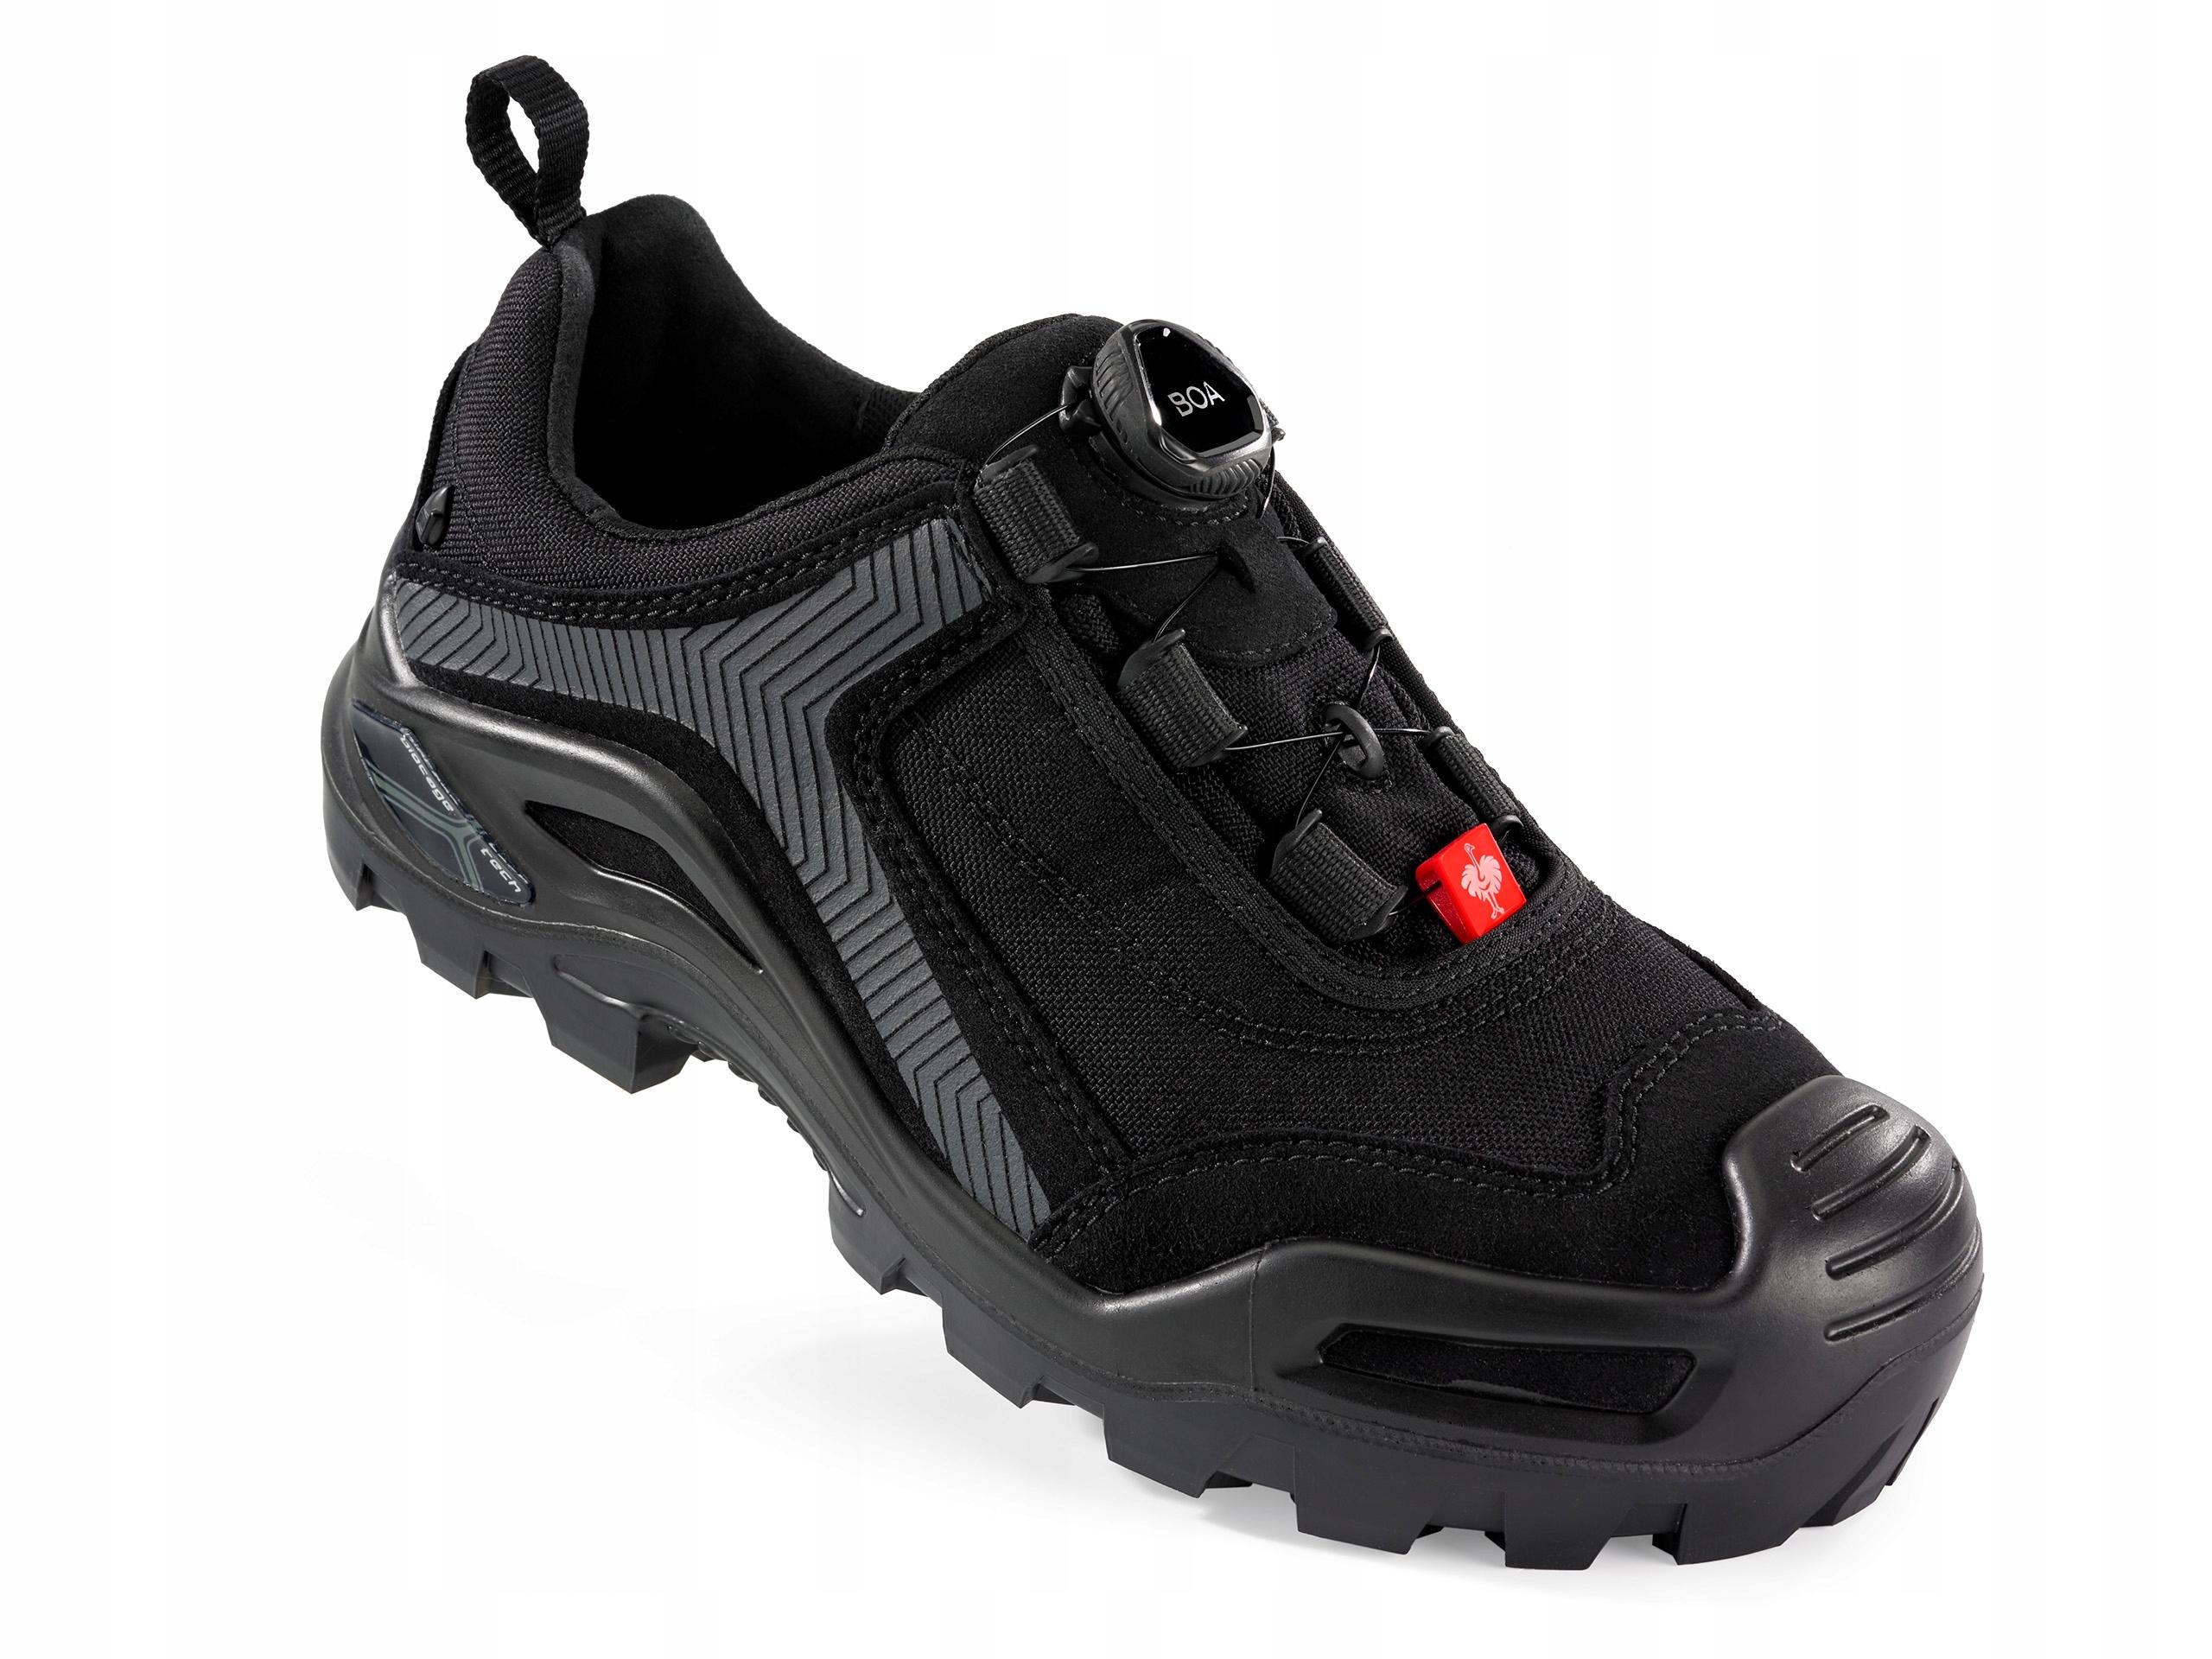 Engelbert Strauss Kastra S3 защитная рабочая обувь